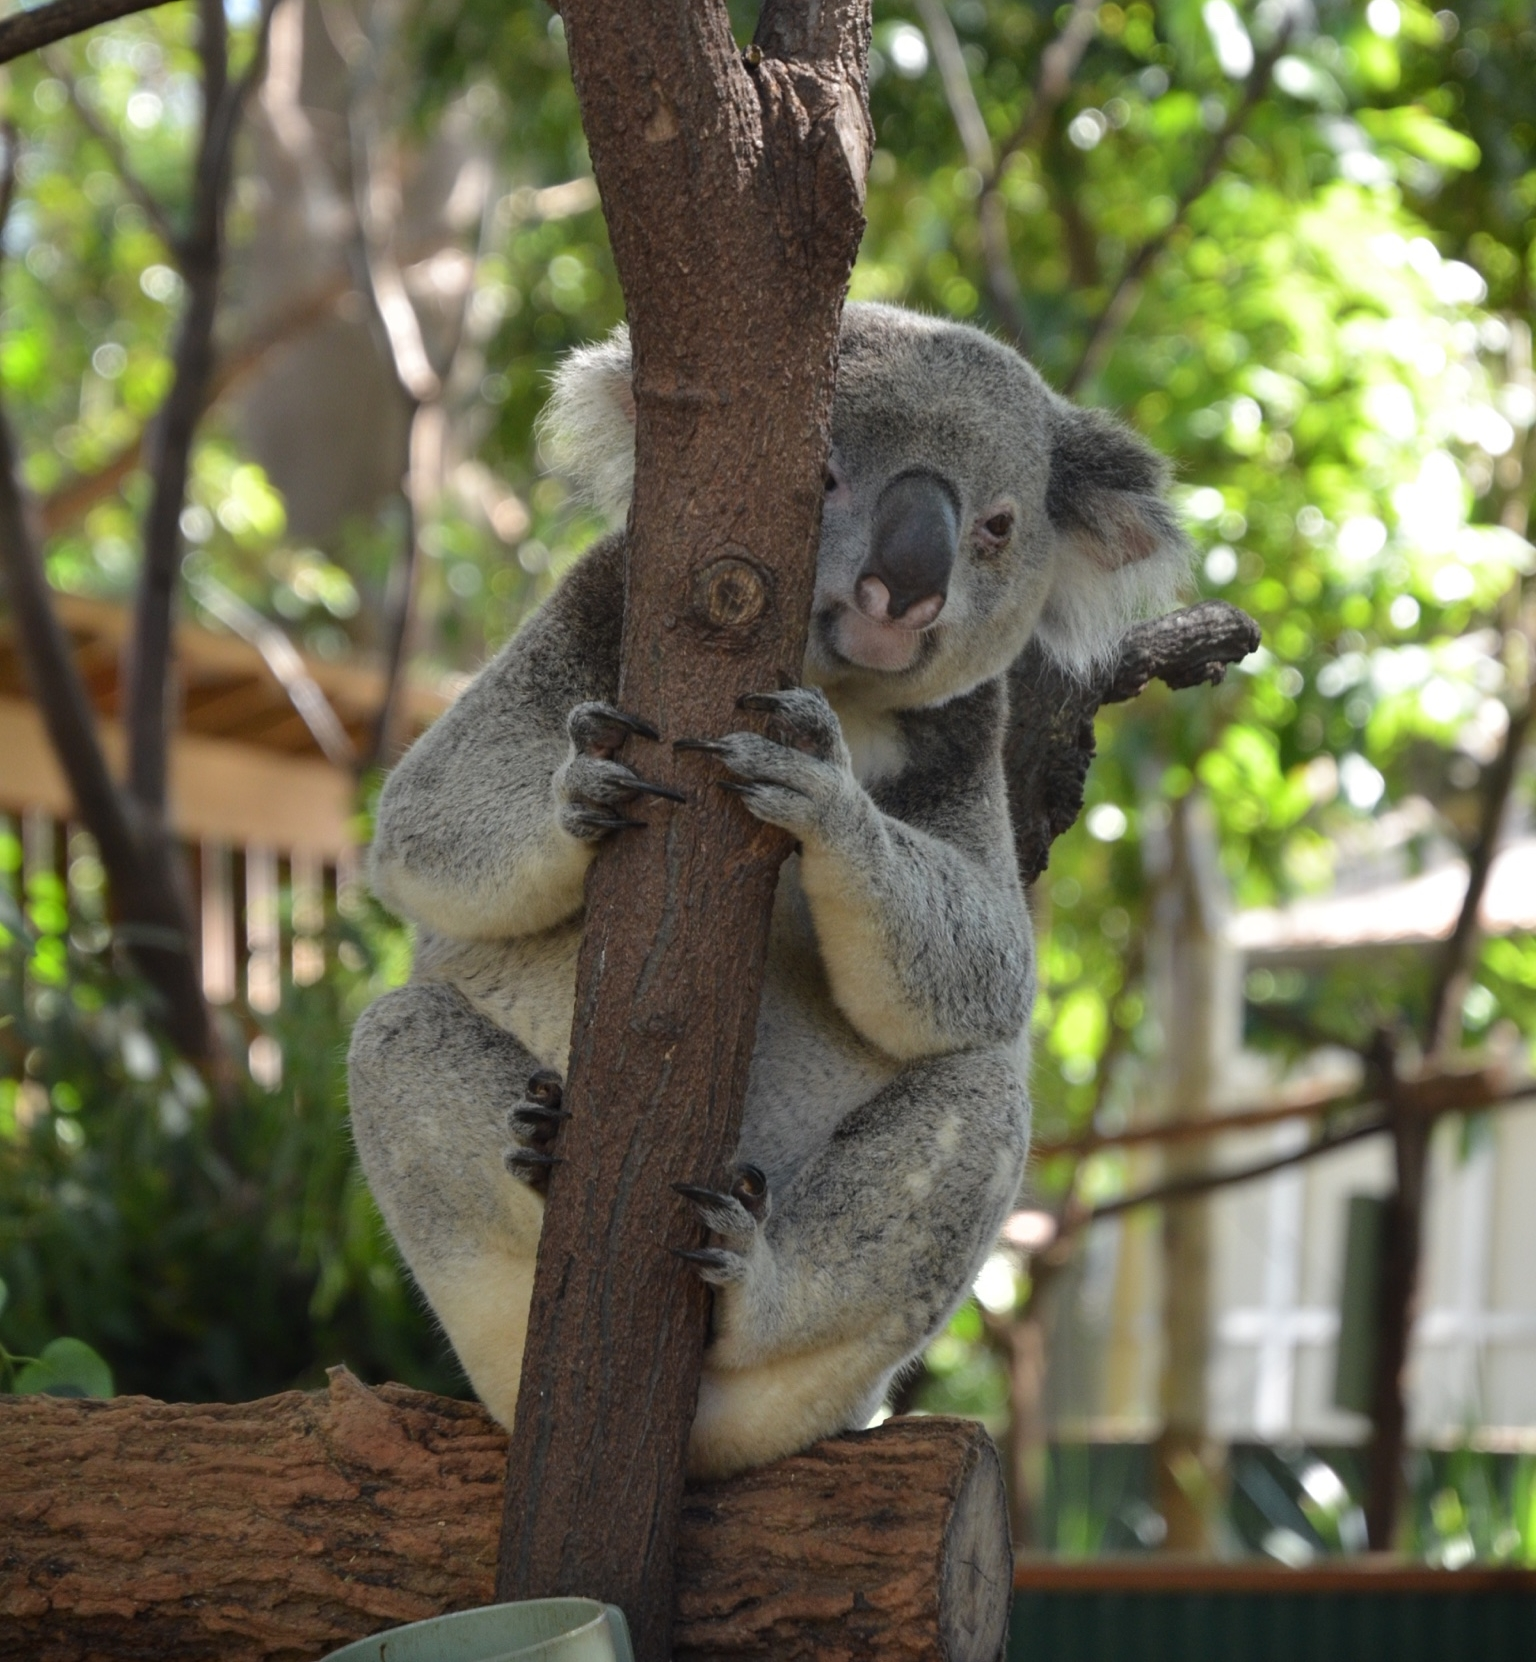 Koala, Currumbin Wildlife Sanctuary, Surfer's Paradise by Miles Dean for The Doubtful Traveller